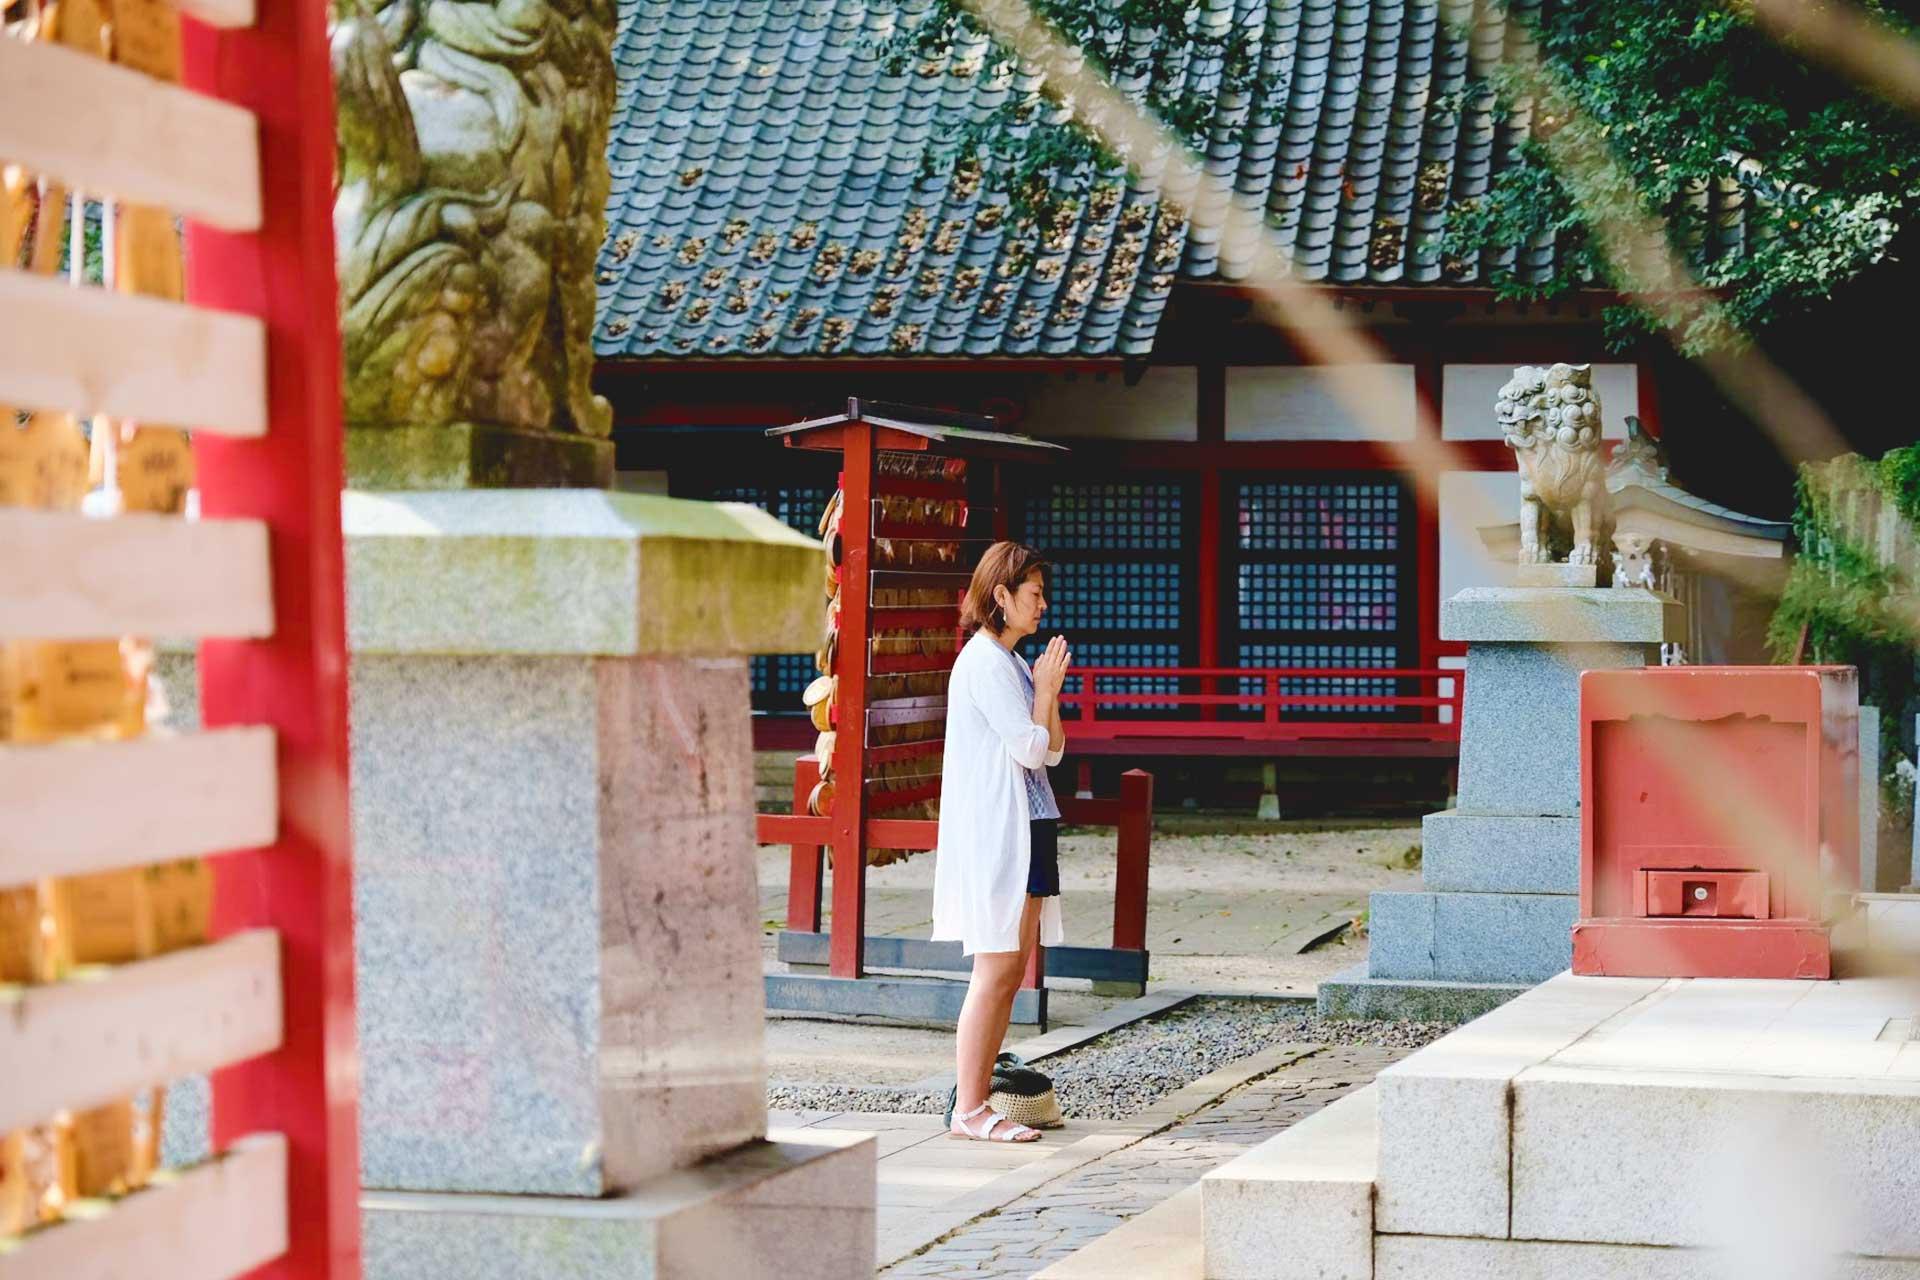 health and beauty guru praying at Asami Shrine in Beppu